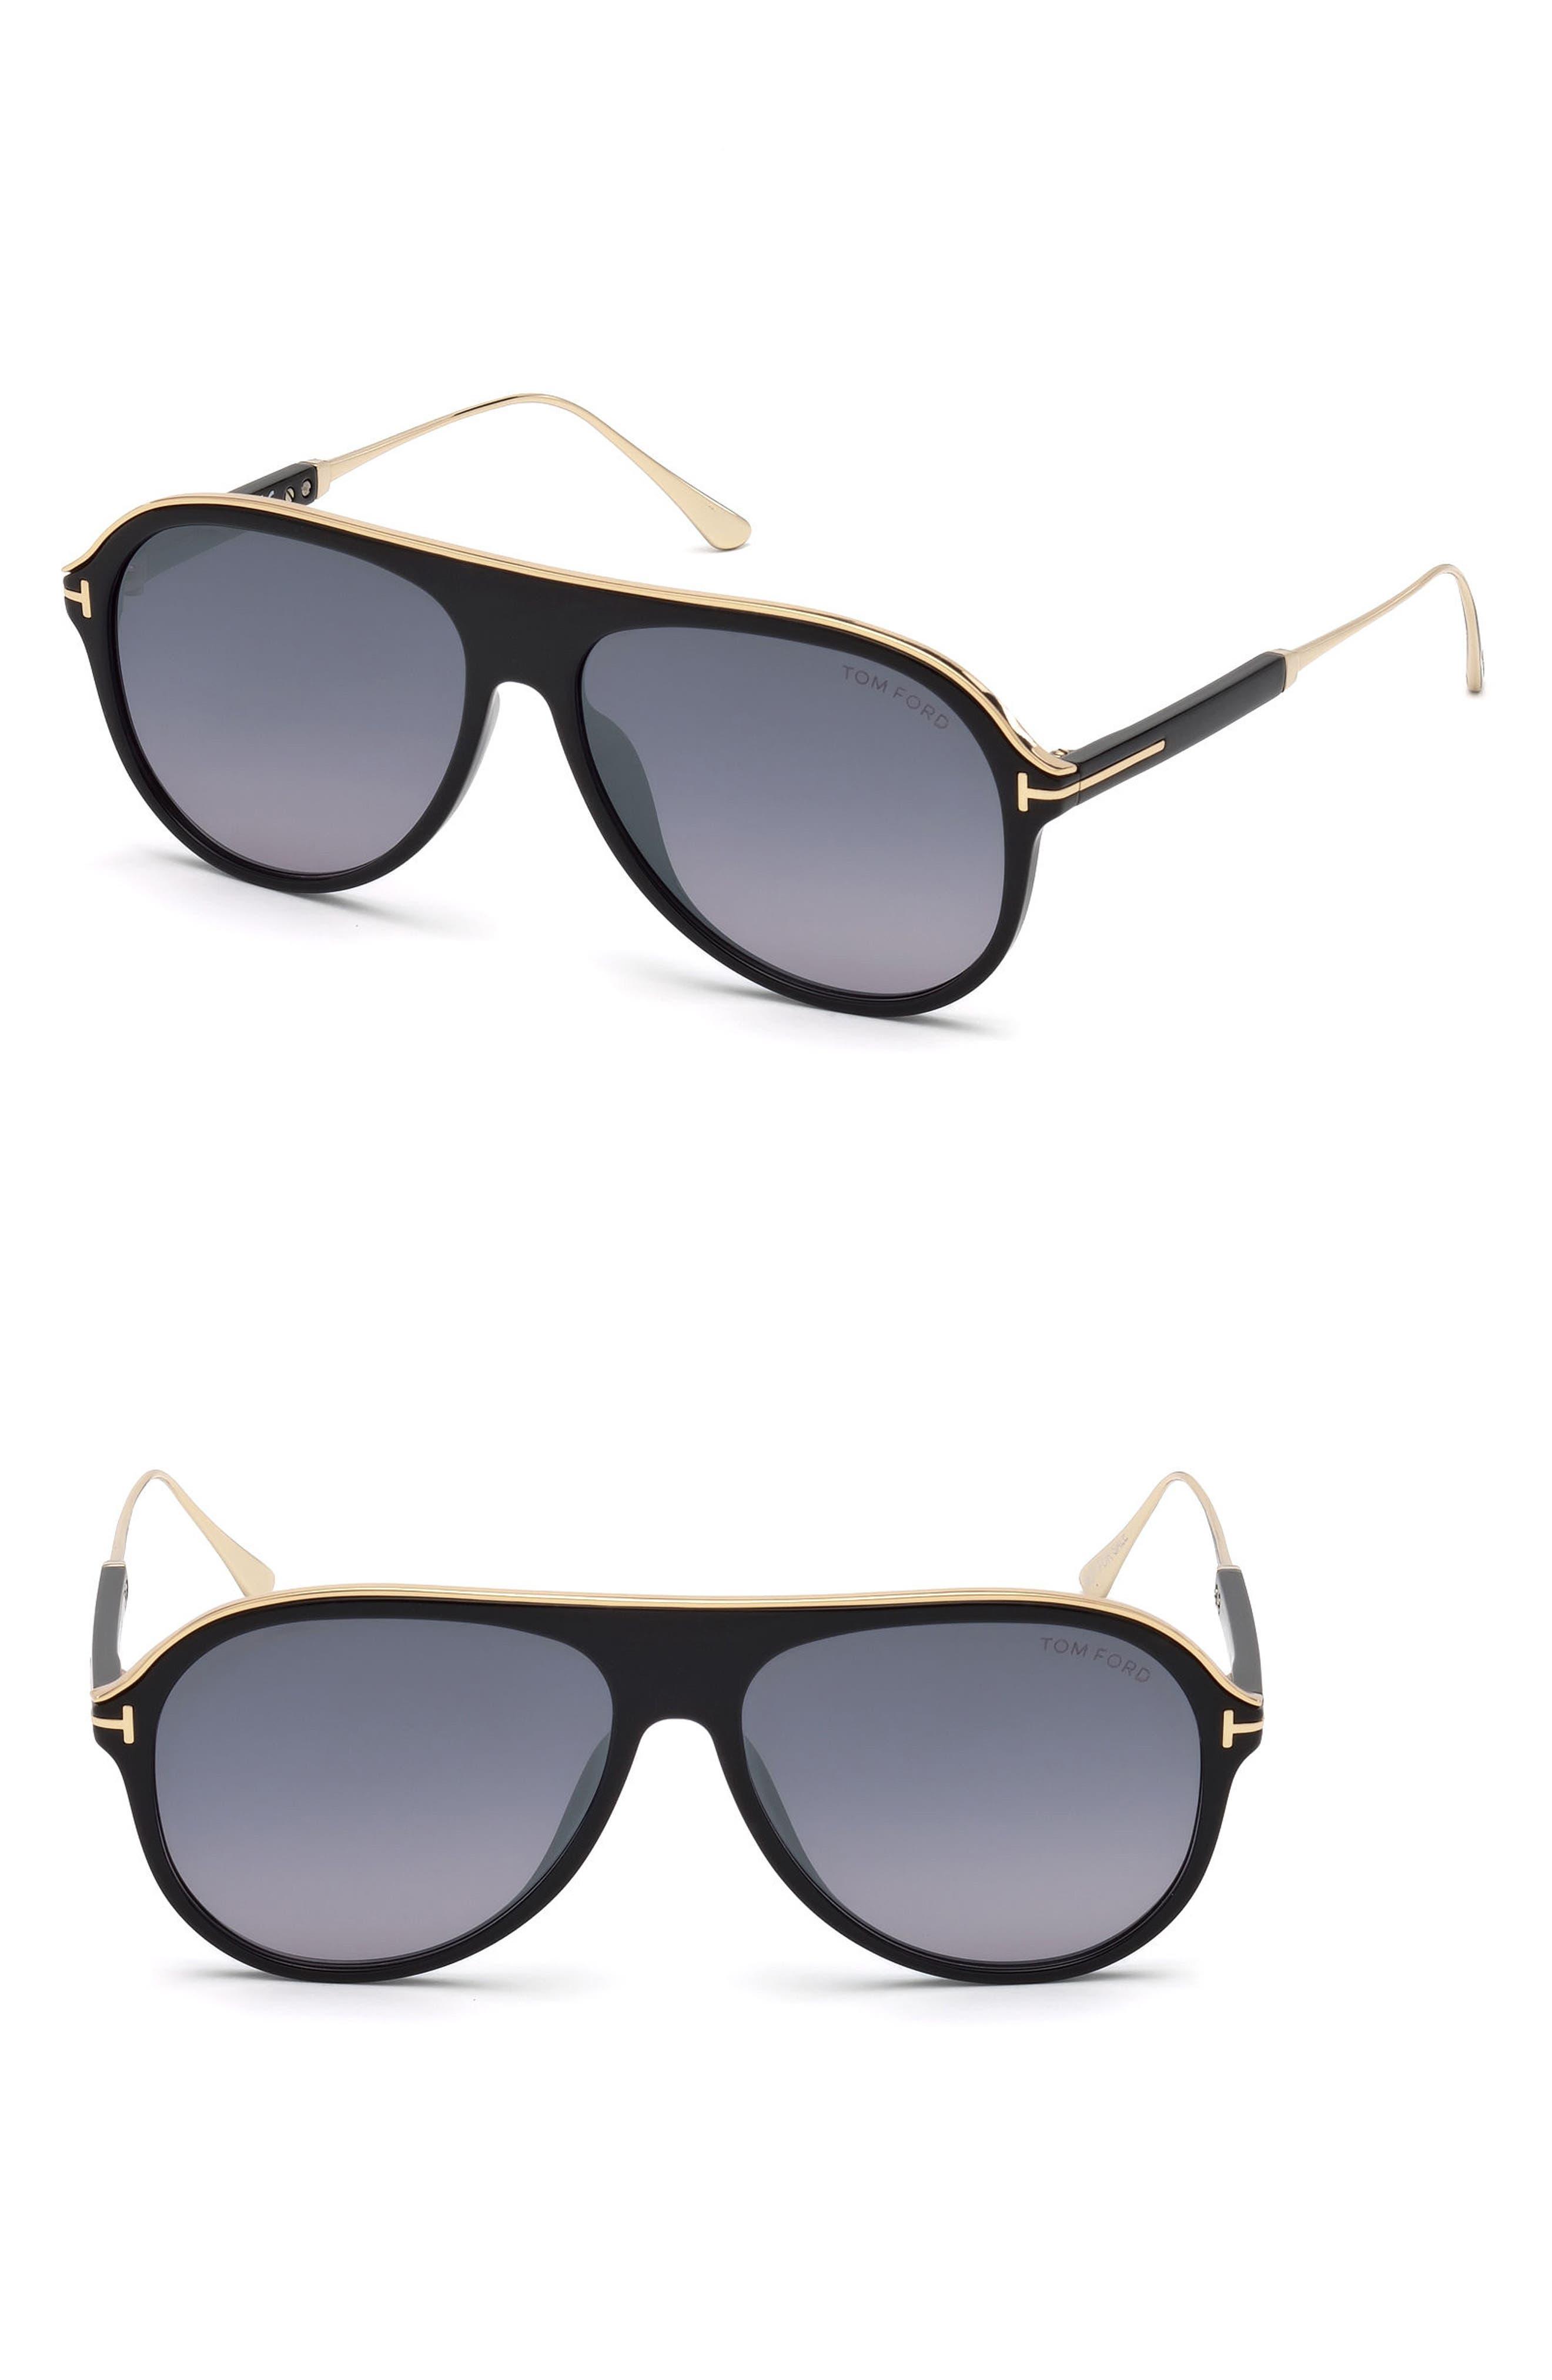 Nicholai-02 57mm Sunglasses,                         Main,                         color, Shiny Black / Smoke Mirror